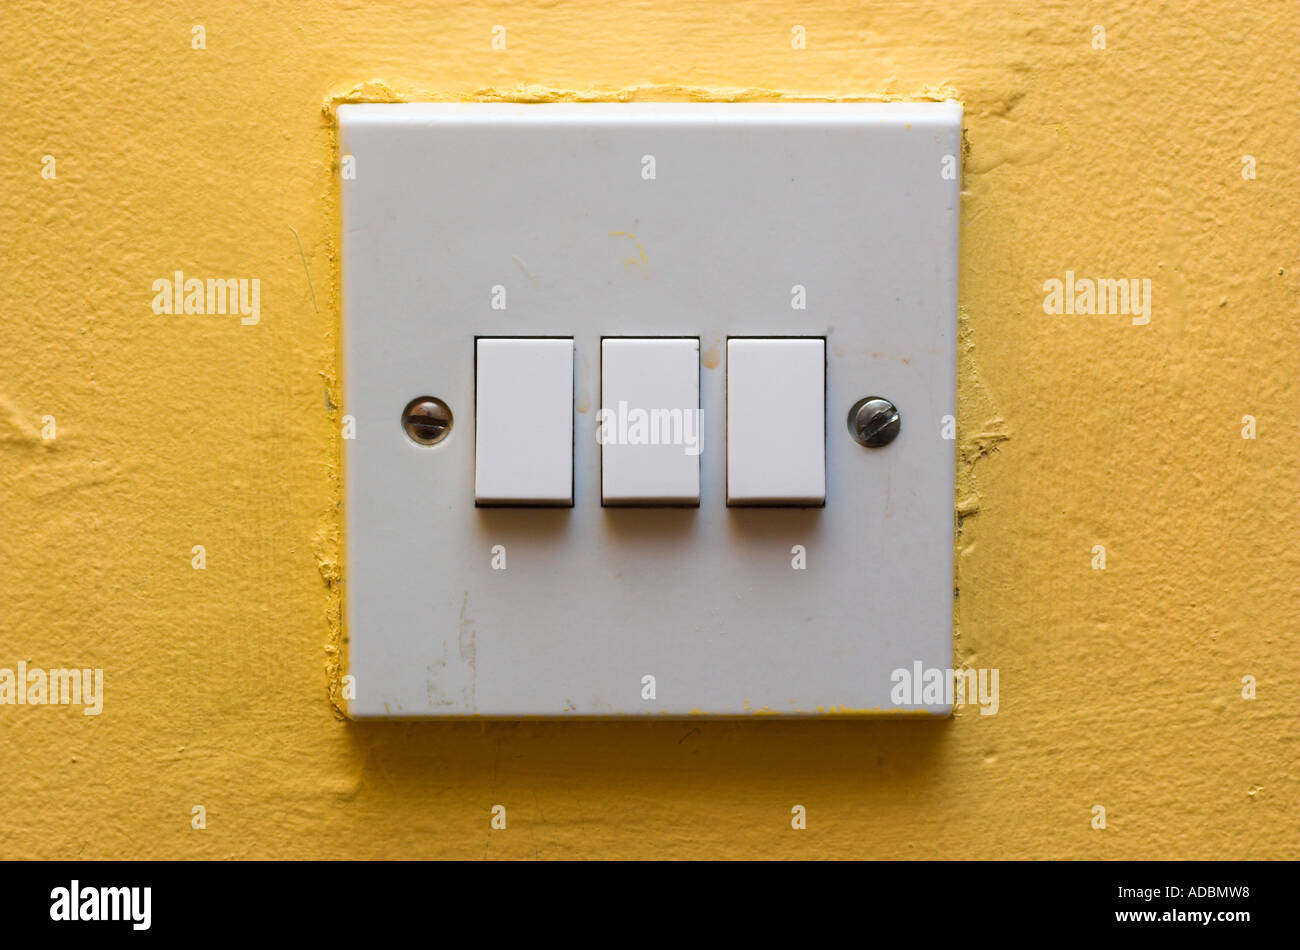 Drei Schalter Stockfoto, Bild: 7639703 - Alamy